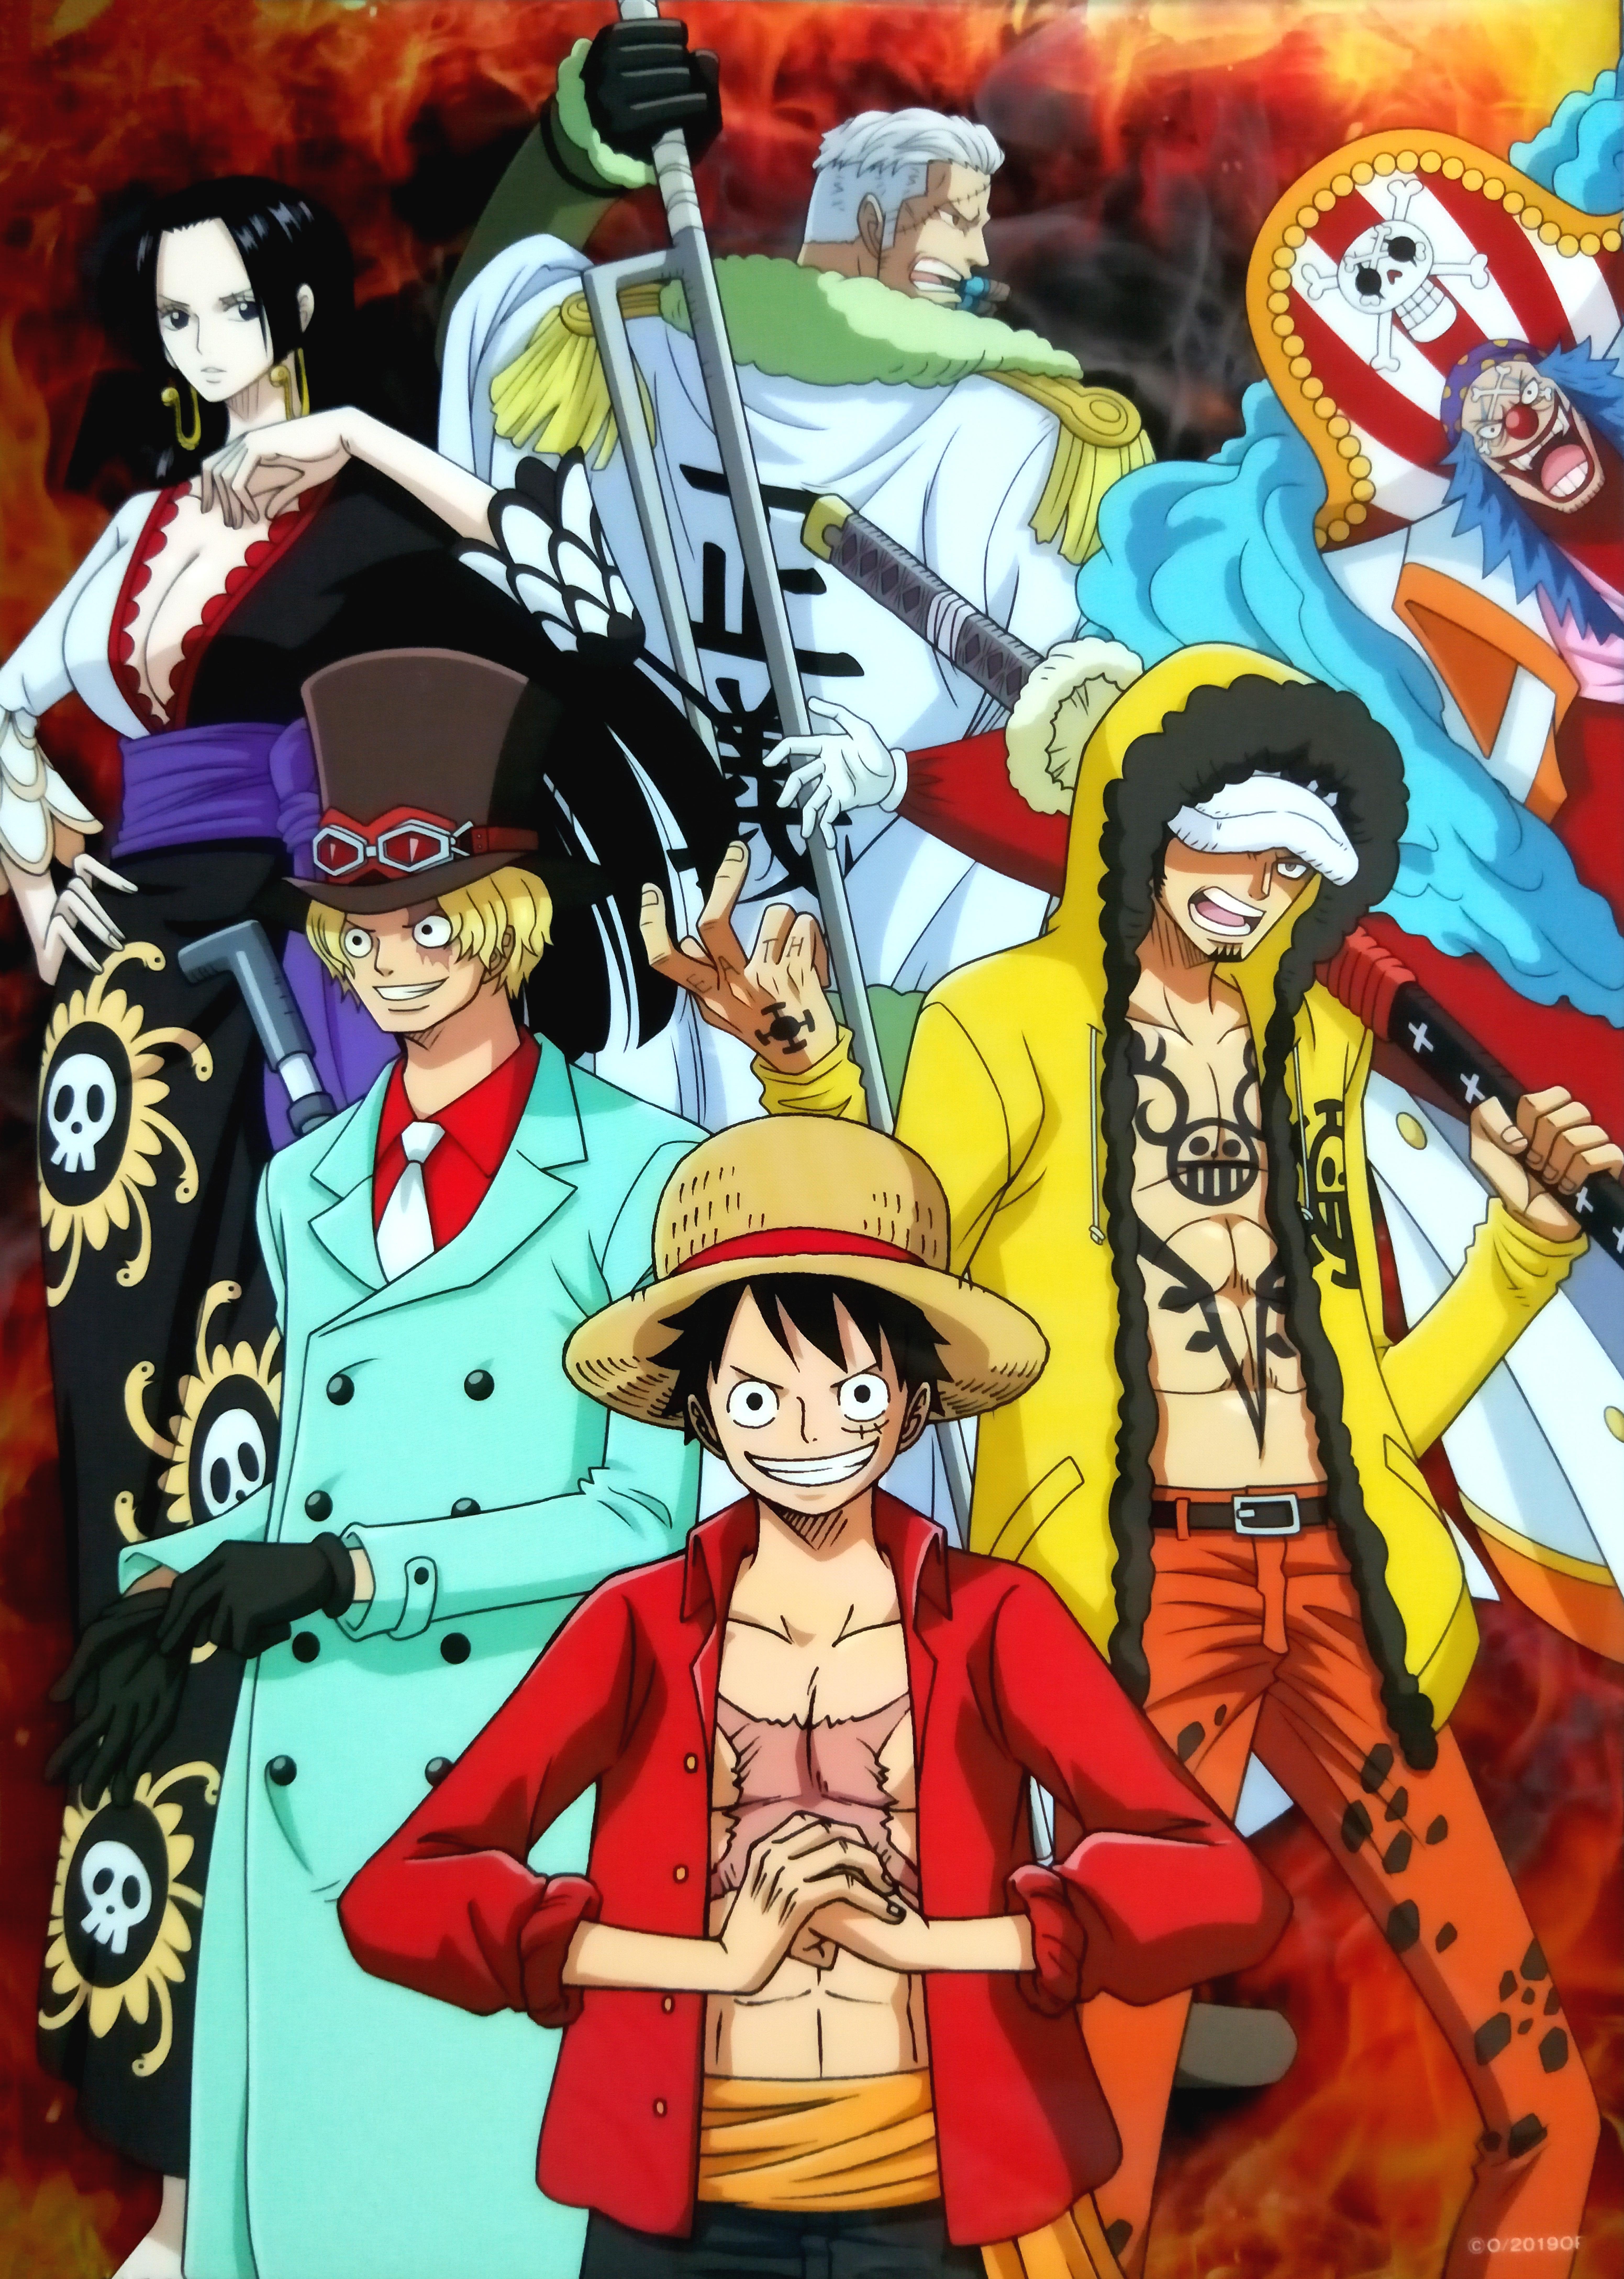 ONE PIECE STAMPEDE Image #2680943 - Zerochan Anime Image Board